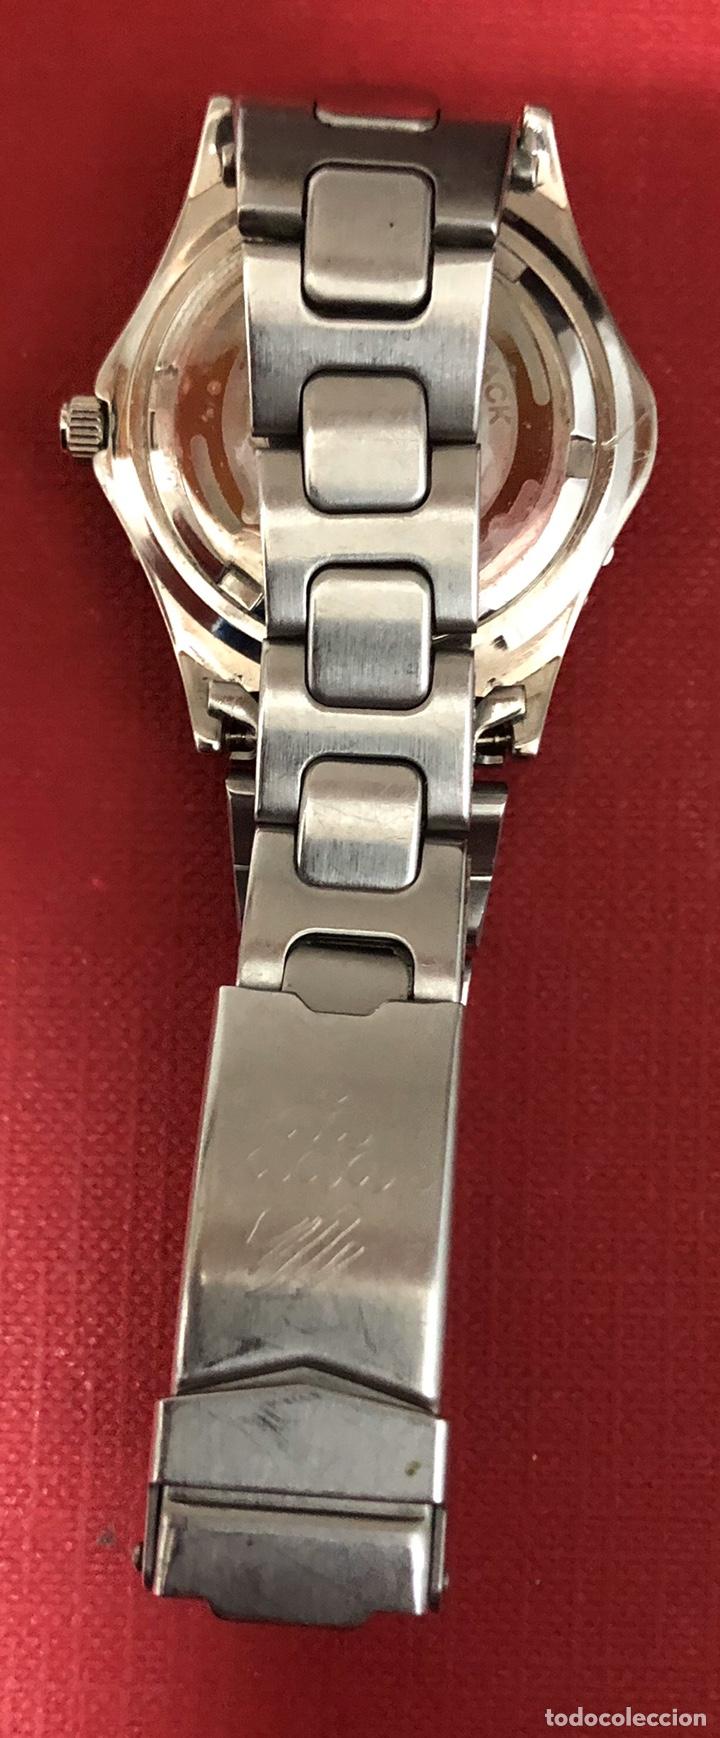 Relojes: Bonito reloj de señora, de cuarzo Gino Bernard. - Foto 5 - 191927088